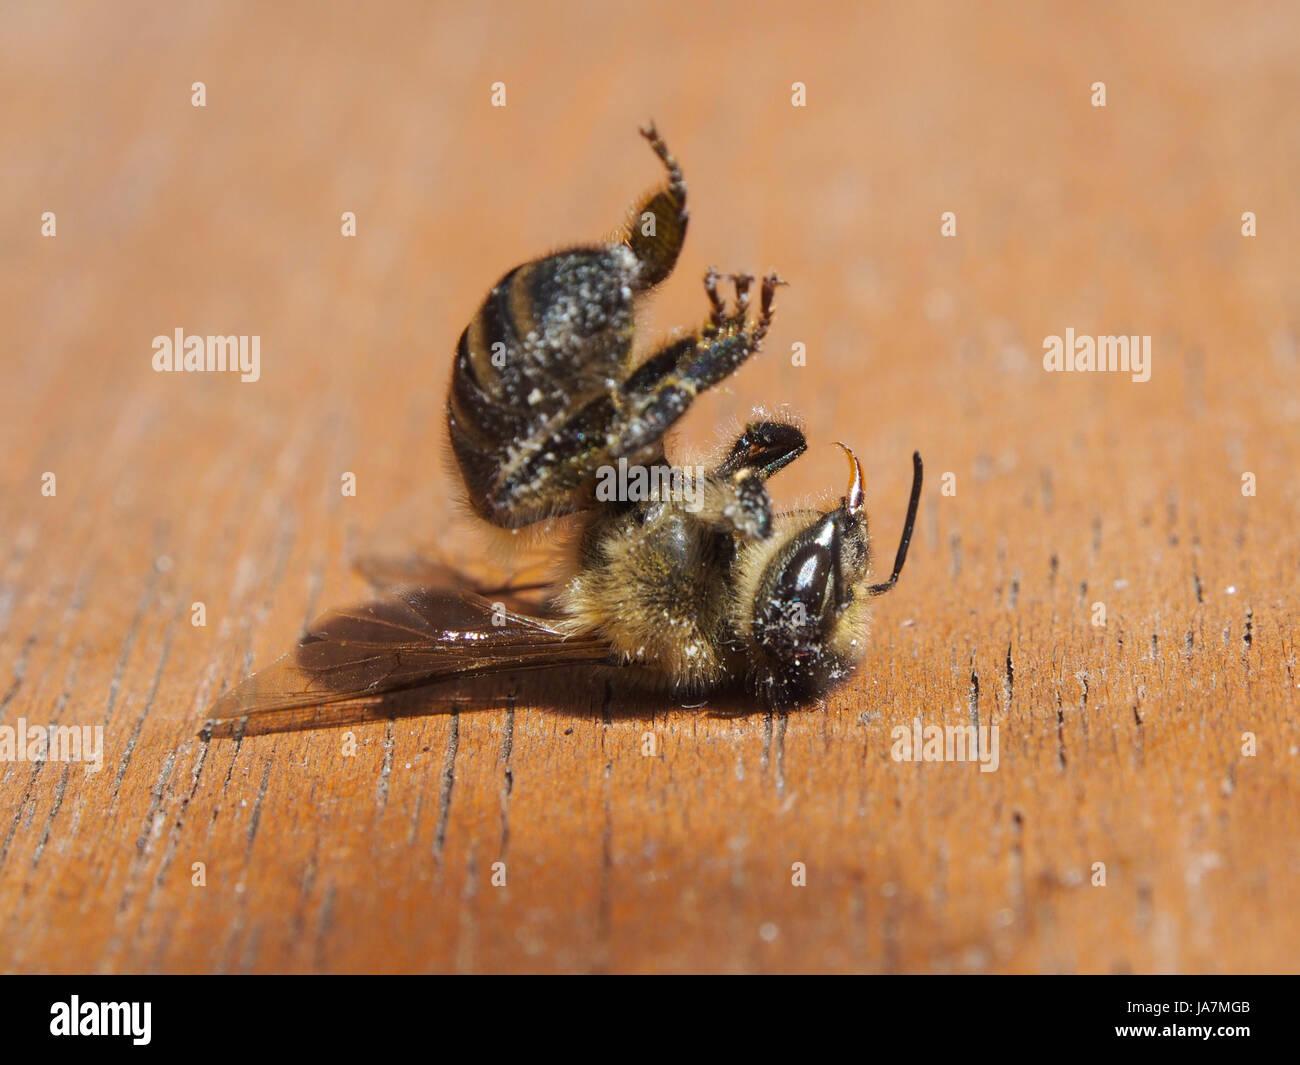 a-dead-bee-JA7MGB.jpg